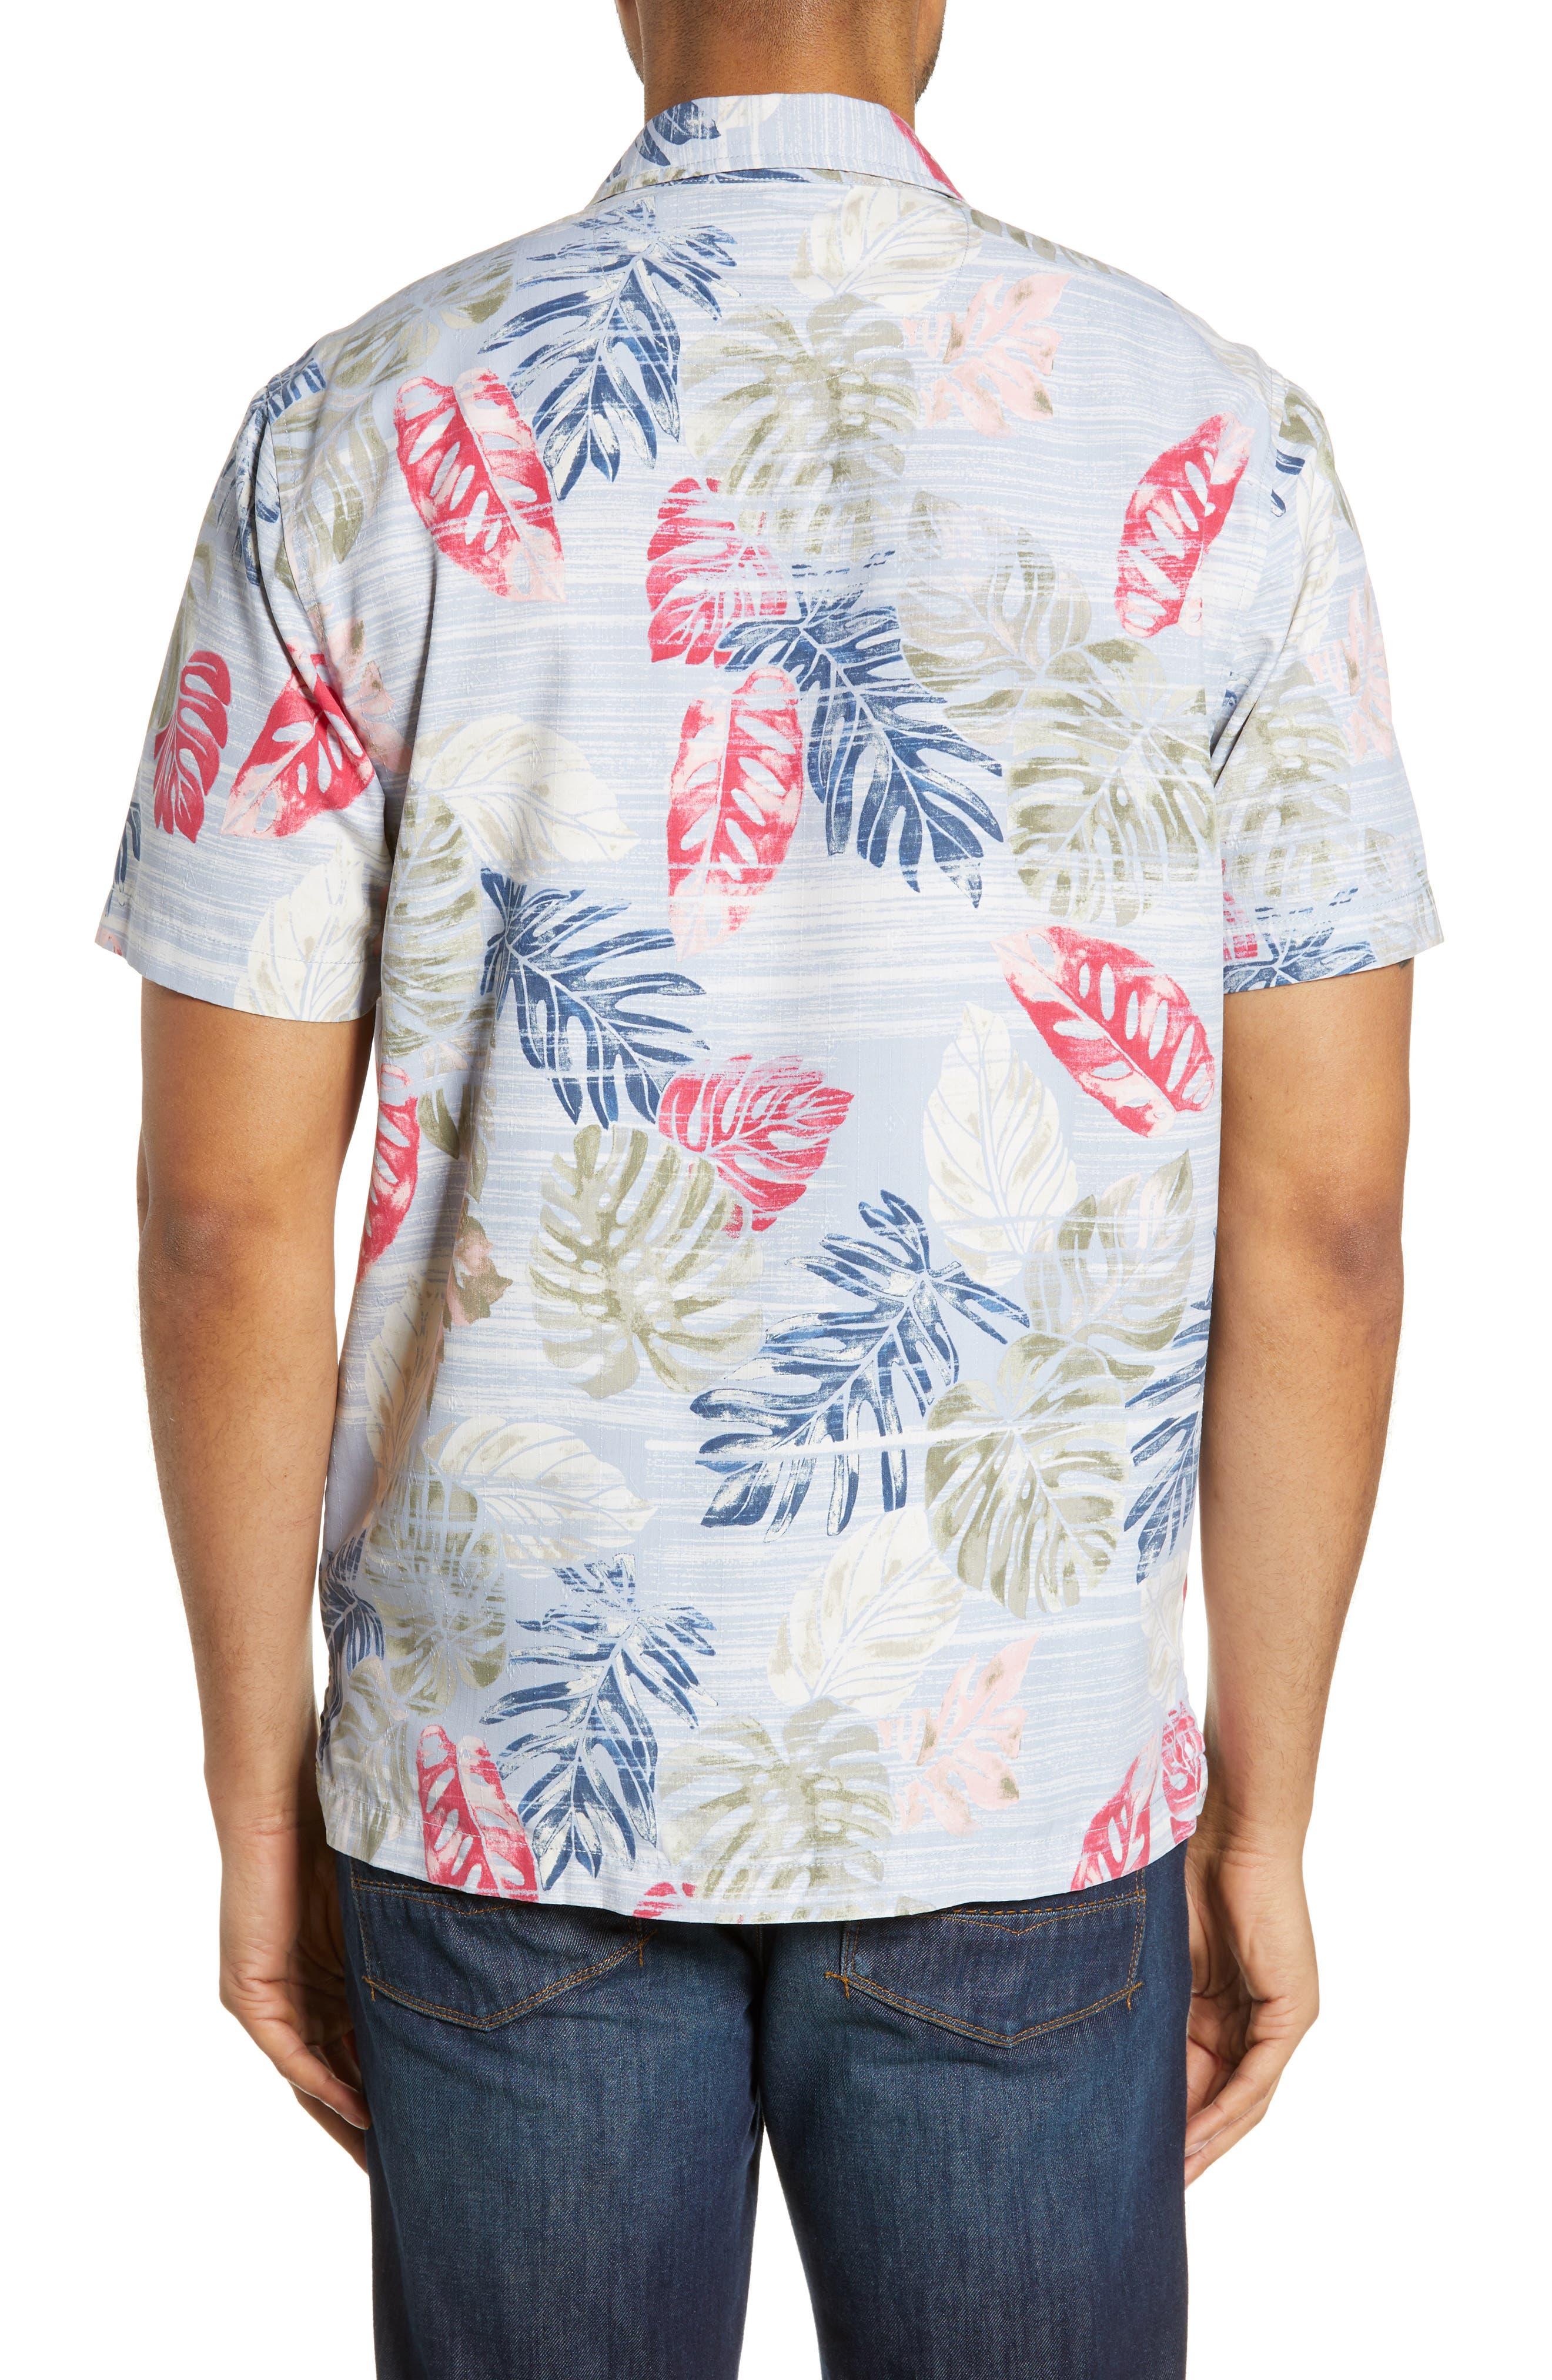 TOMMY BAHAMA,                             Botanica Sketch Silk Blend Shirt,                             Alternate thumbnail 3, color,                             CANYON SKY